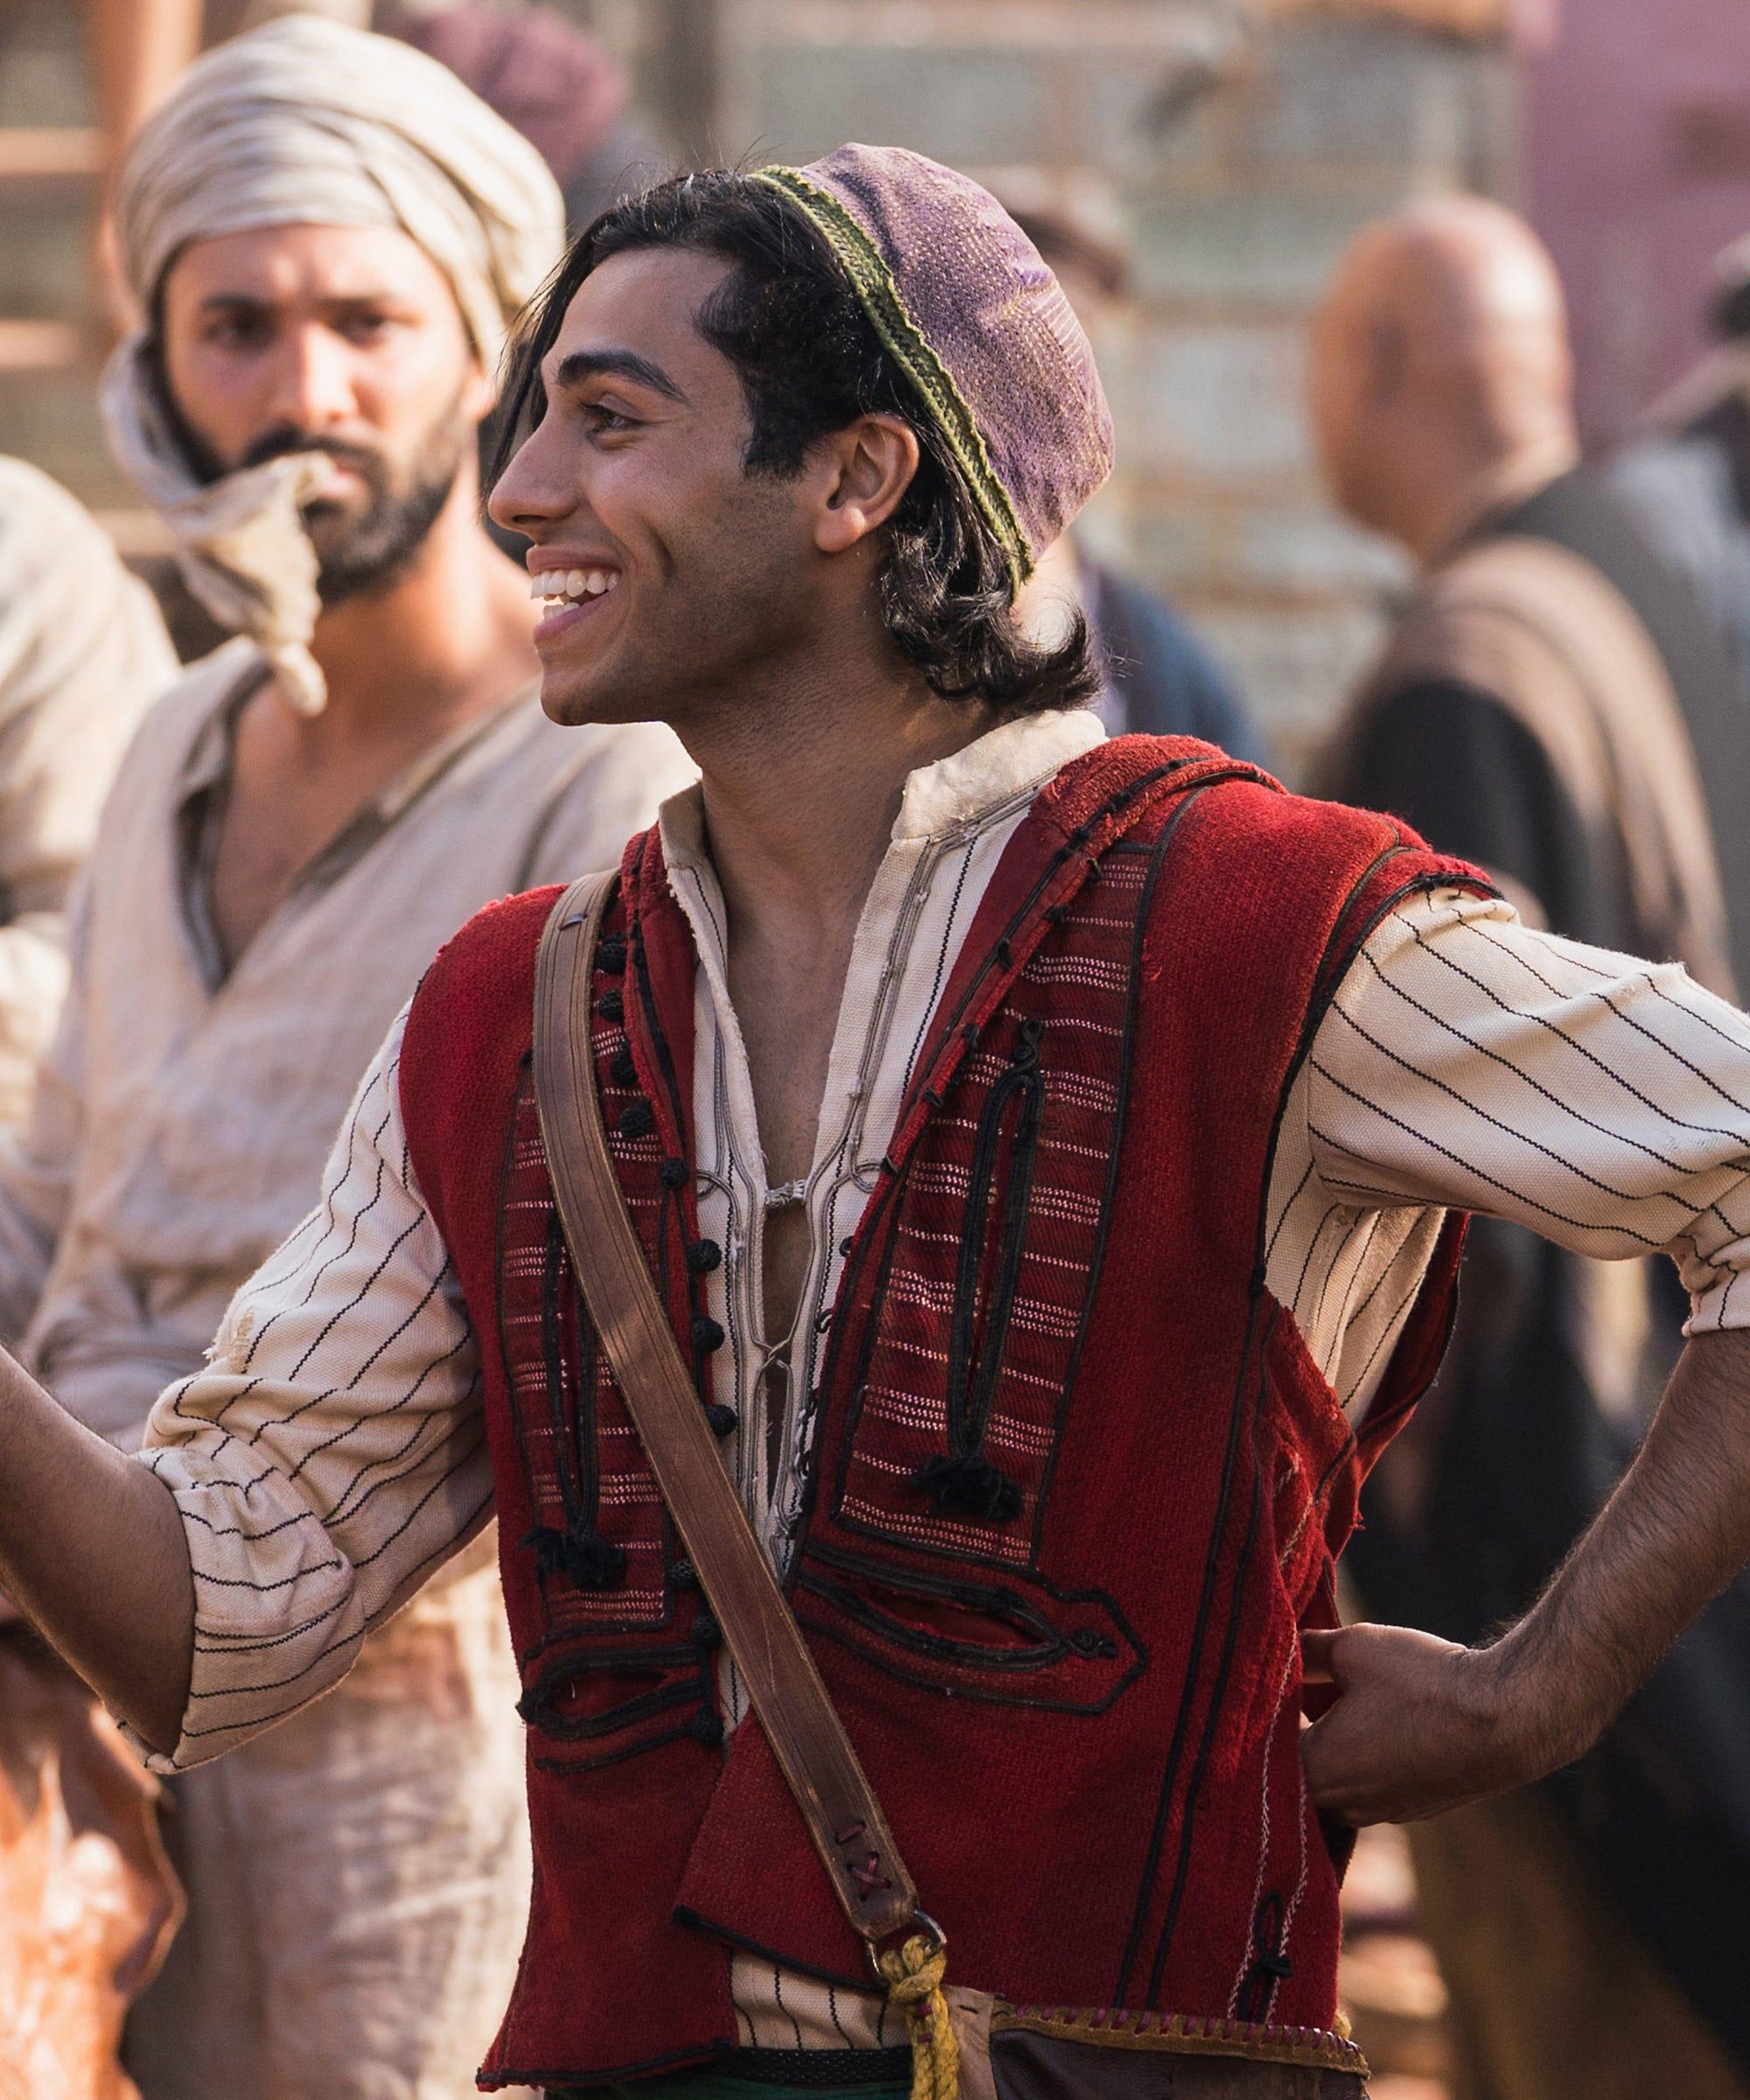 A Very Necessary Primer On Aladdin's Mena Massoud, Your New Favorite Disney Prince